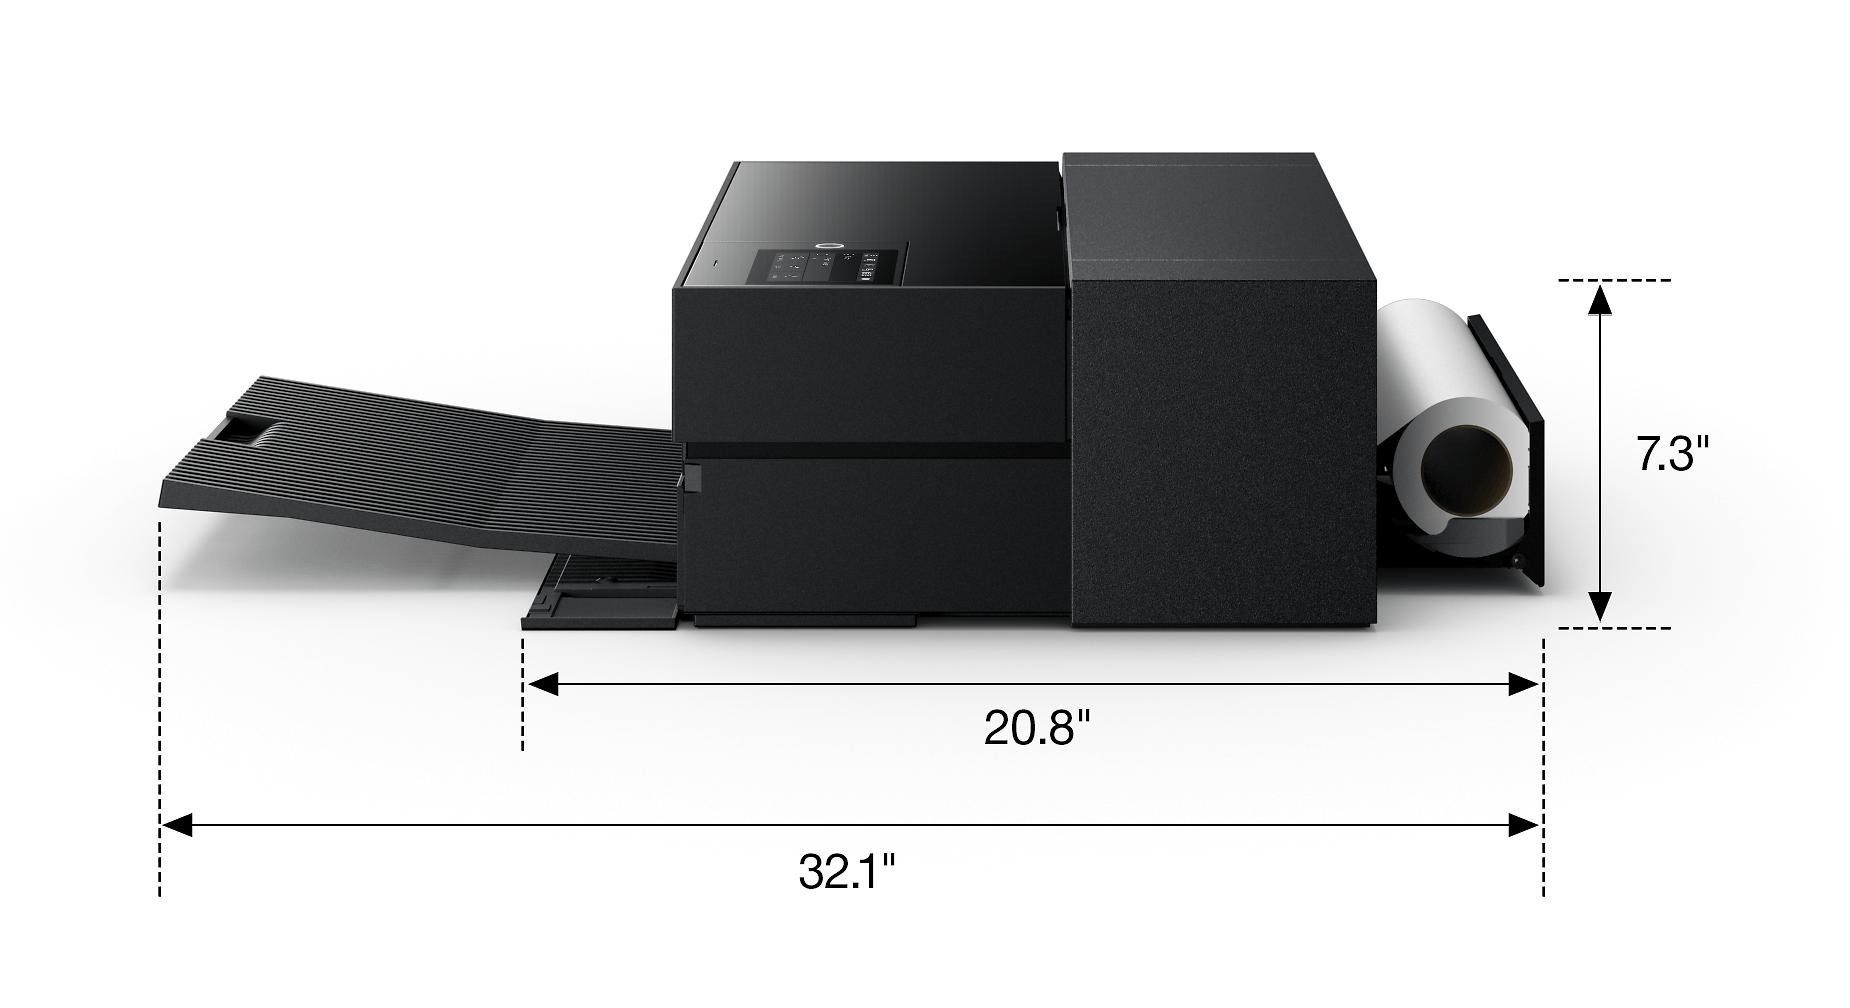 Epson SureColor P706 A3+ Inkjet Printer Image